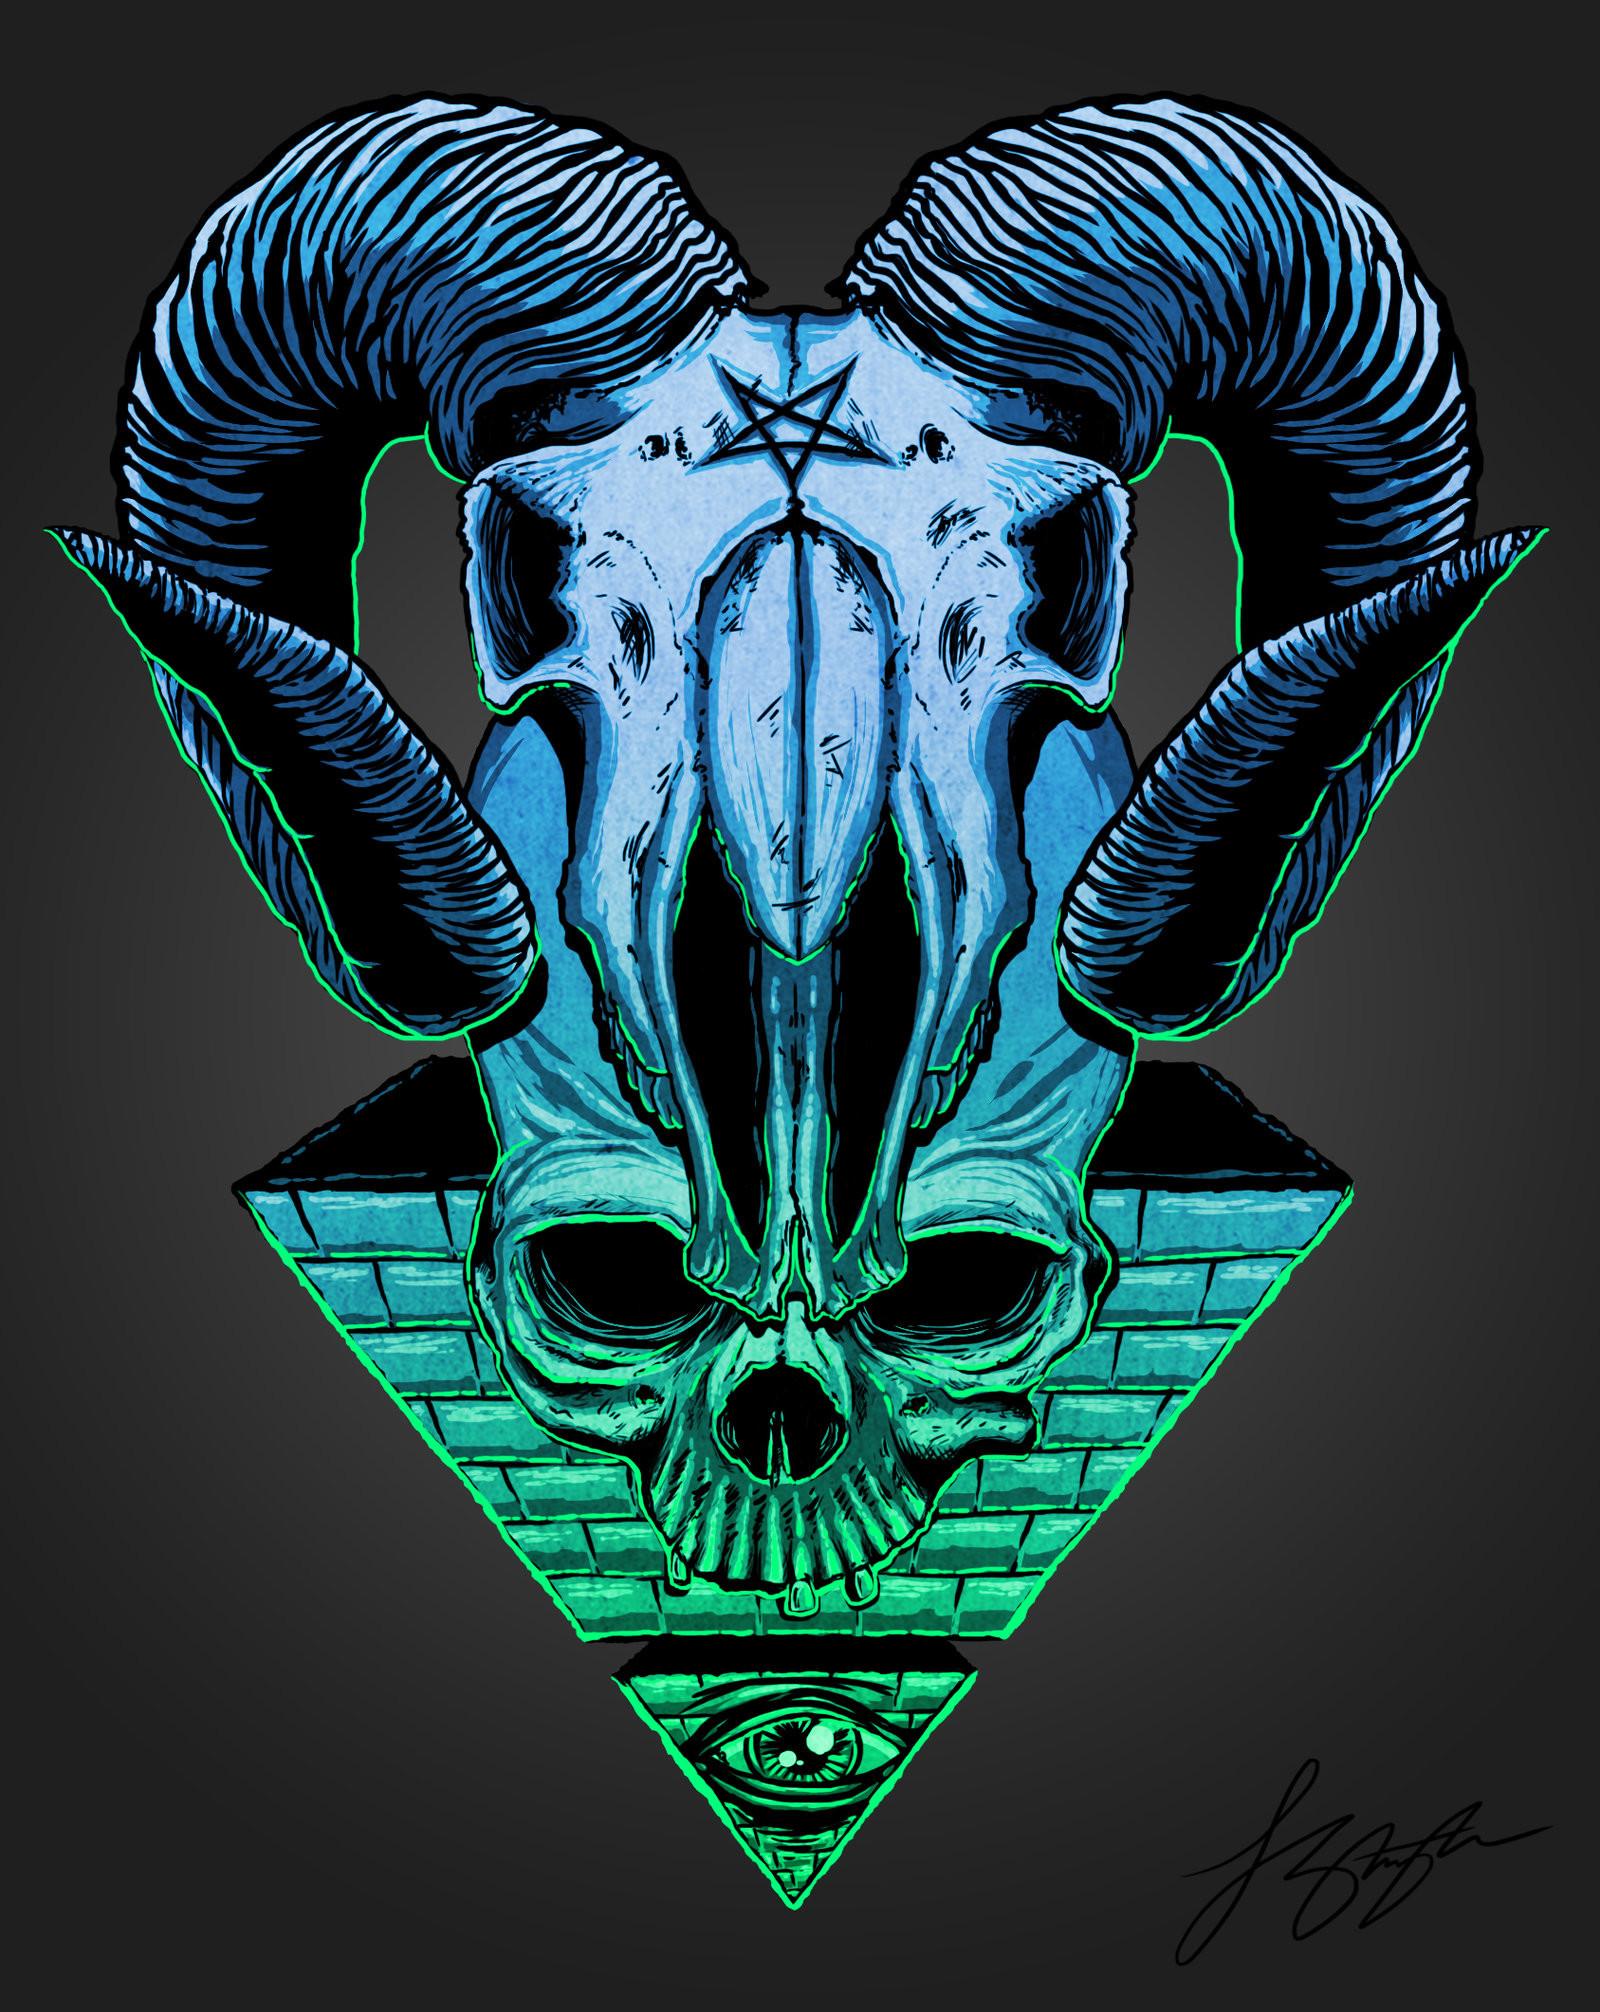 … All seeing eye by liquid-venom